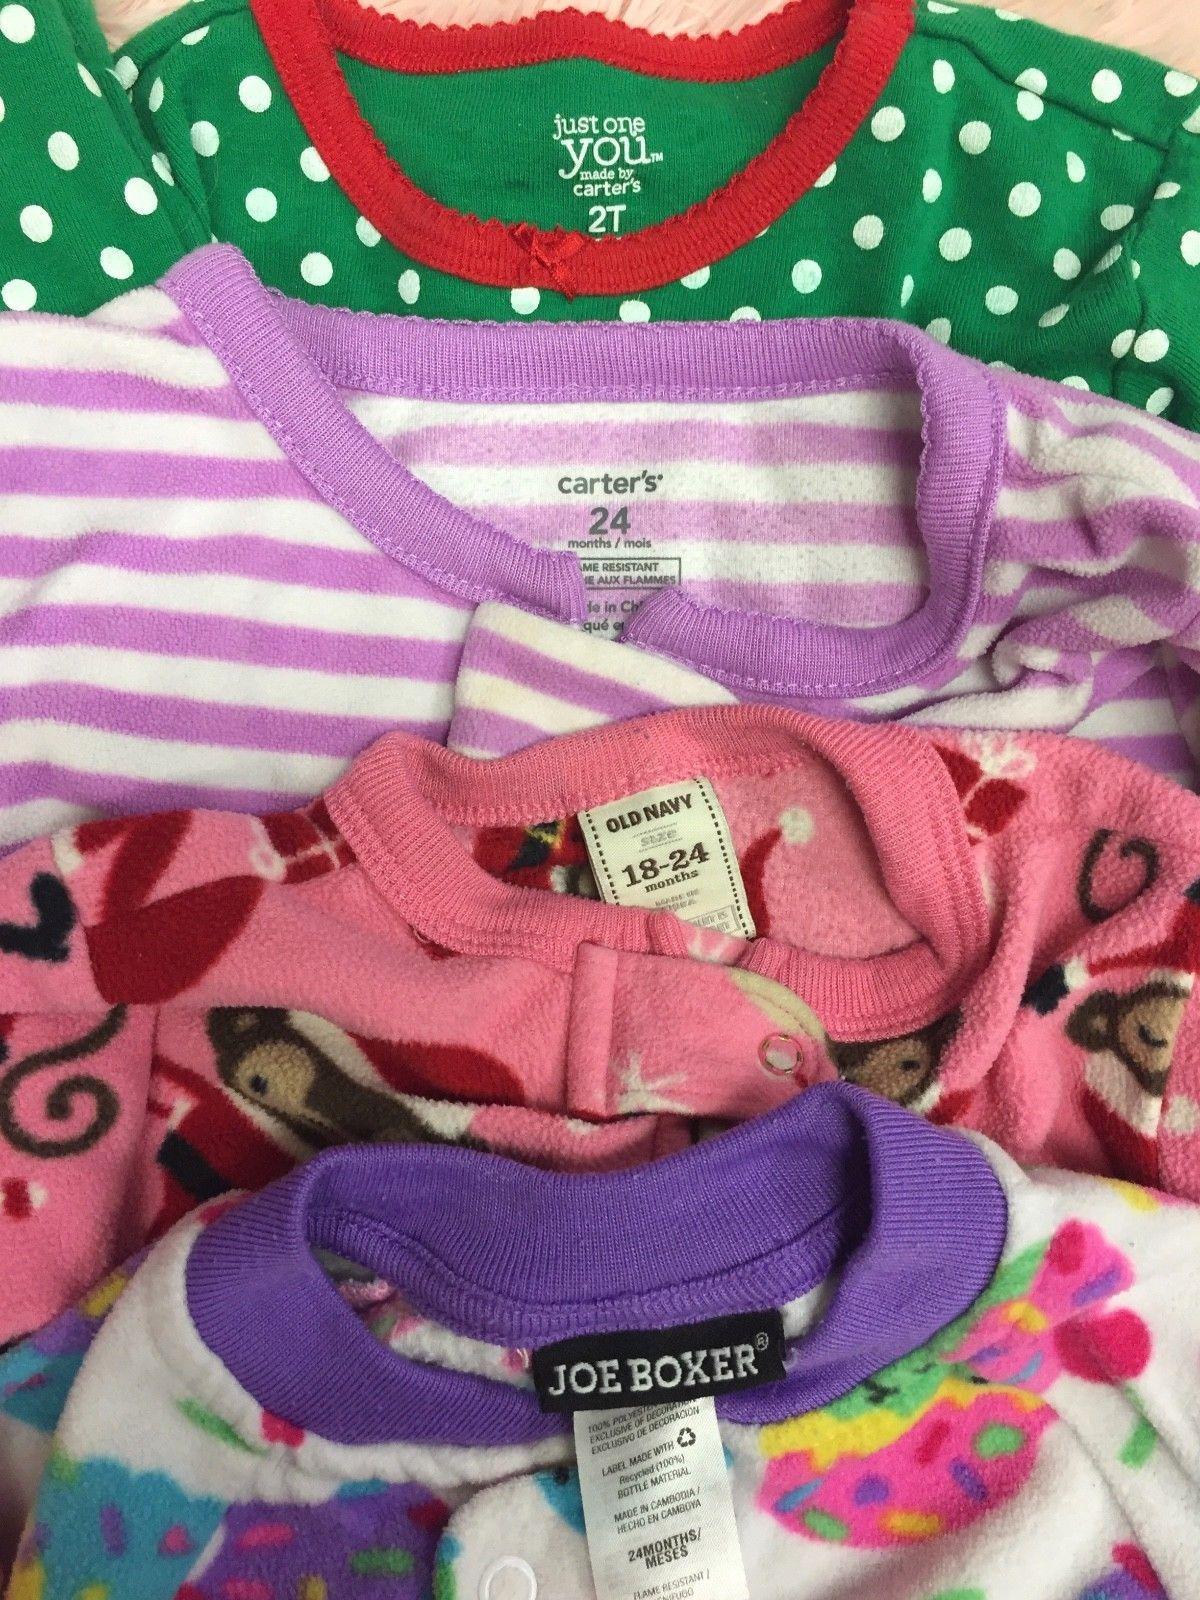 LOT OF 4 Carter's Baby Girls Fleece Sleepers Romper Pajamas 18-24M/2T Christmas